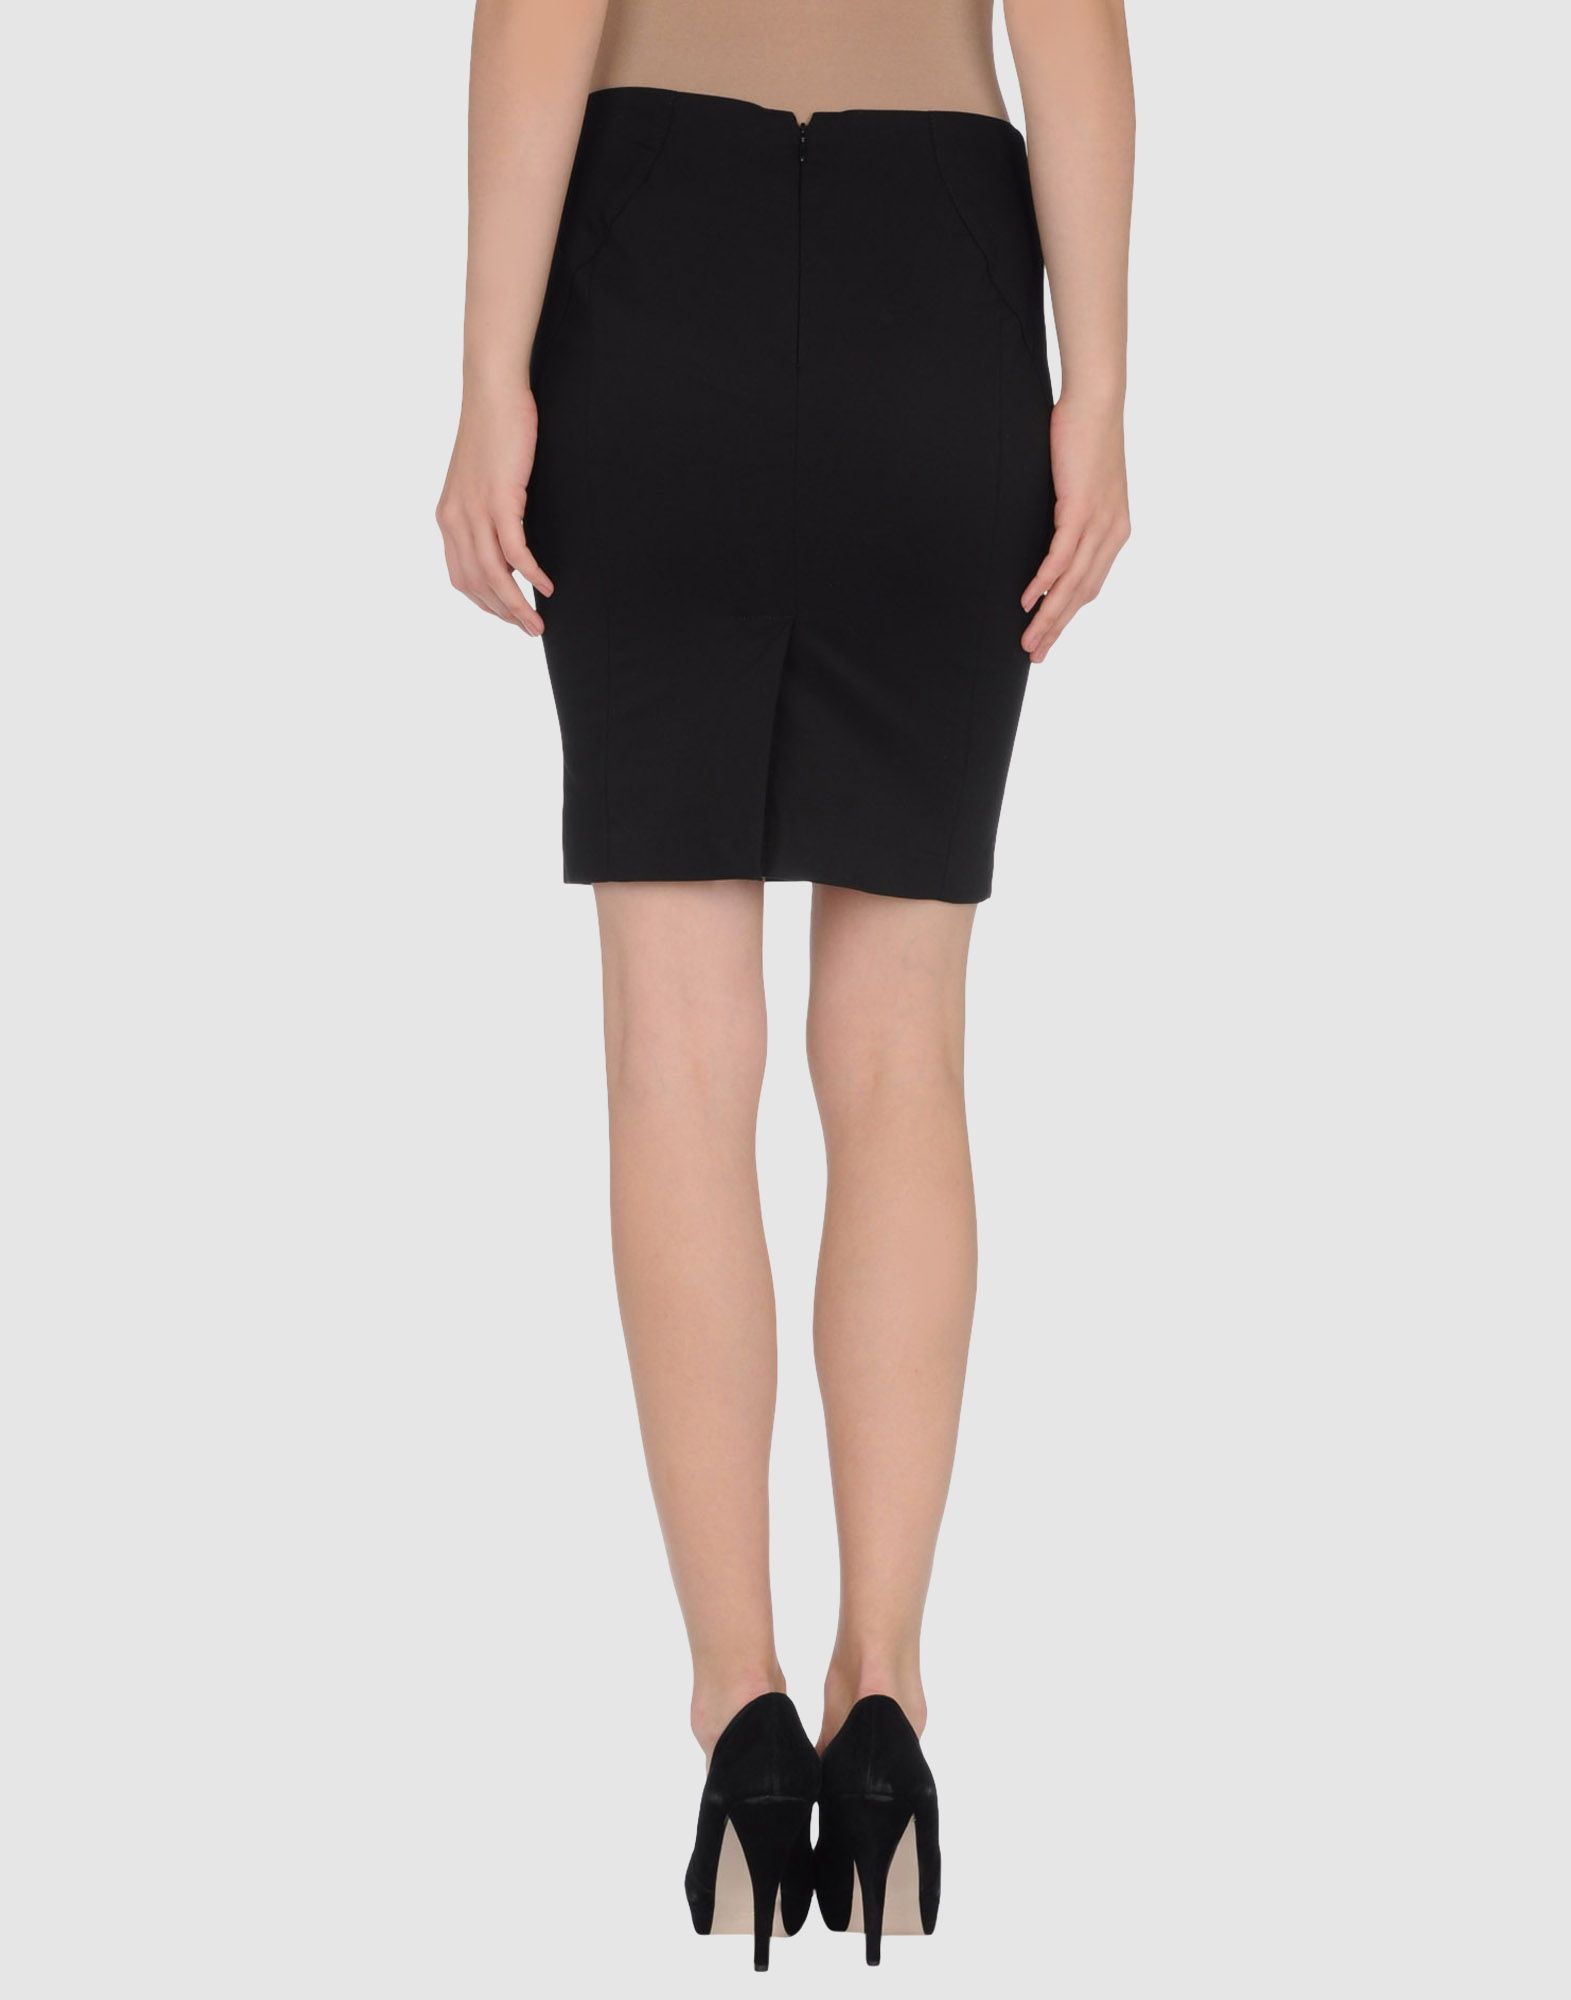 Twinset Black Cotton Skirt